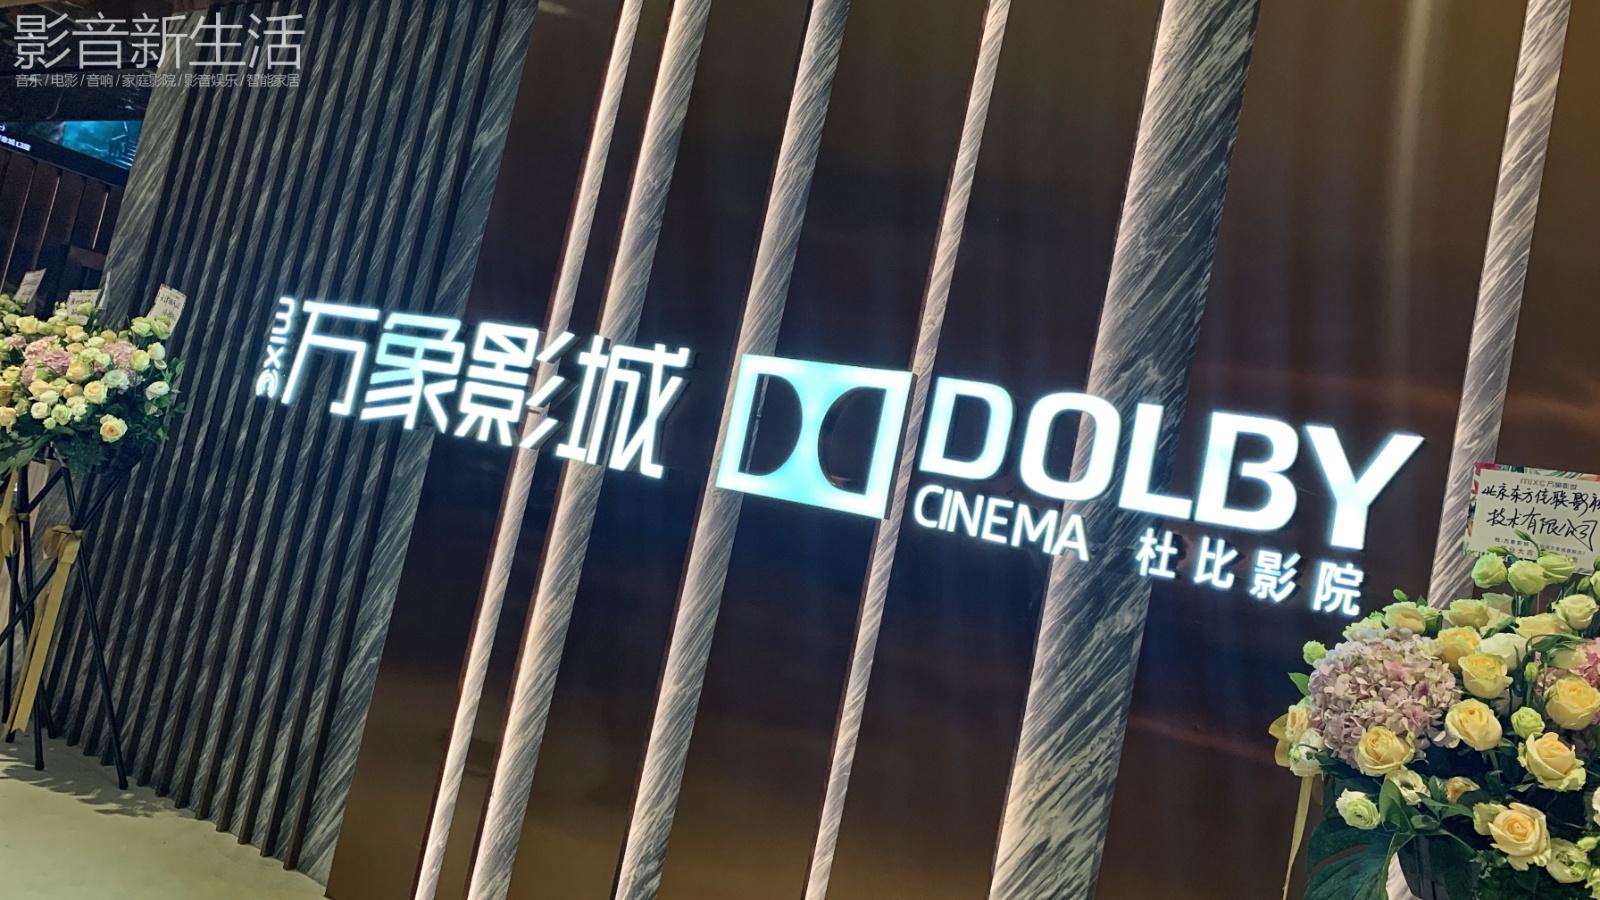 "DOLBY CINEMA SHENZHEN ATMOS DOLBYVISION 5 - 现场   ""影院界的全新标杆"" 深圳首家Dolby Cinema杜比影院落户深圳湾万象城"